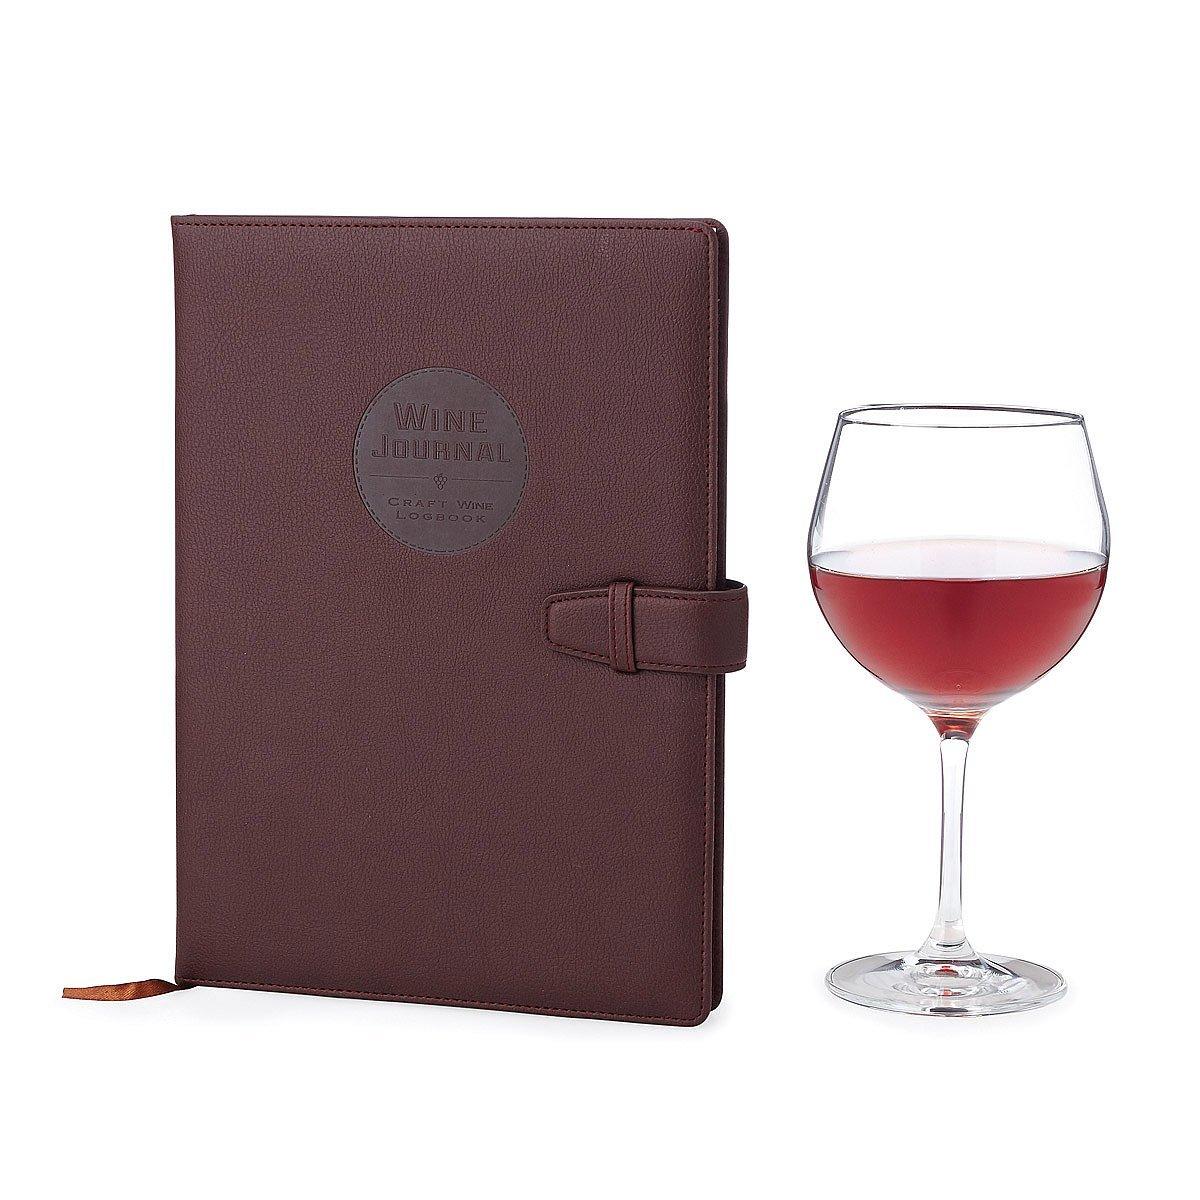 Wine Making Journal | Space for 70+ wine recipes, Wine Glasses, Wine Colors, Wine Bottles, Yeast Strain Information, Wine Label Breakdown |